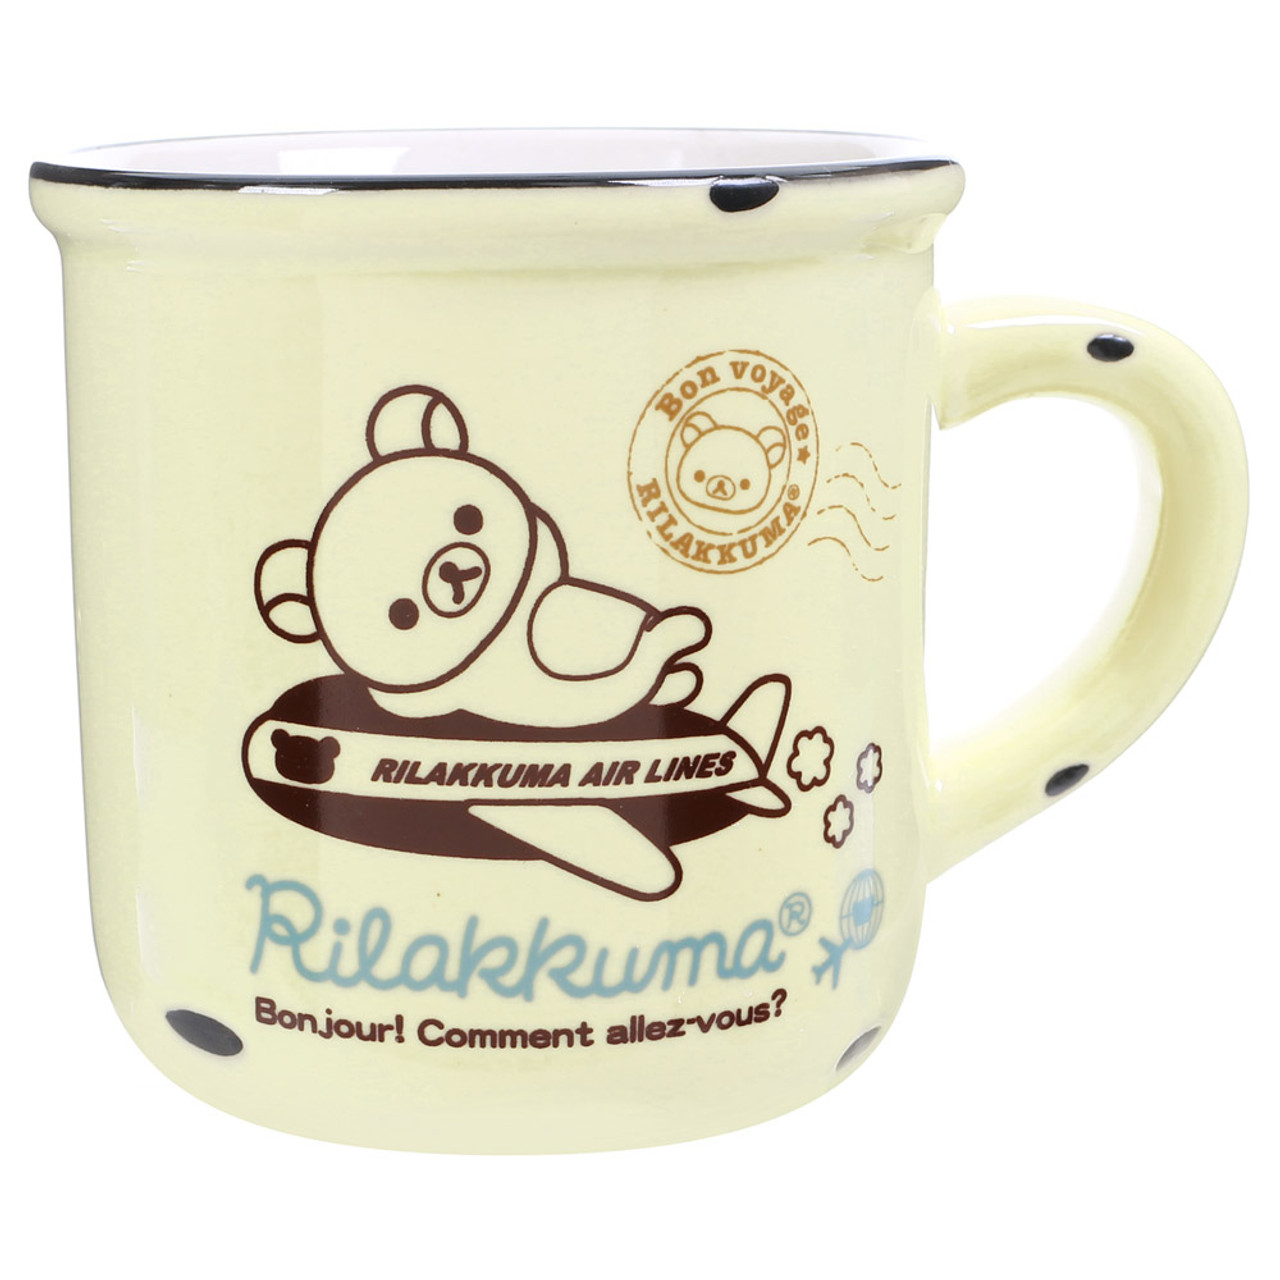 San-x Rilakkuma Cream Color Enamel Style Cup ( Front View )